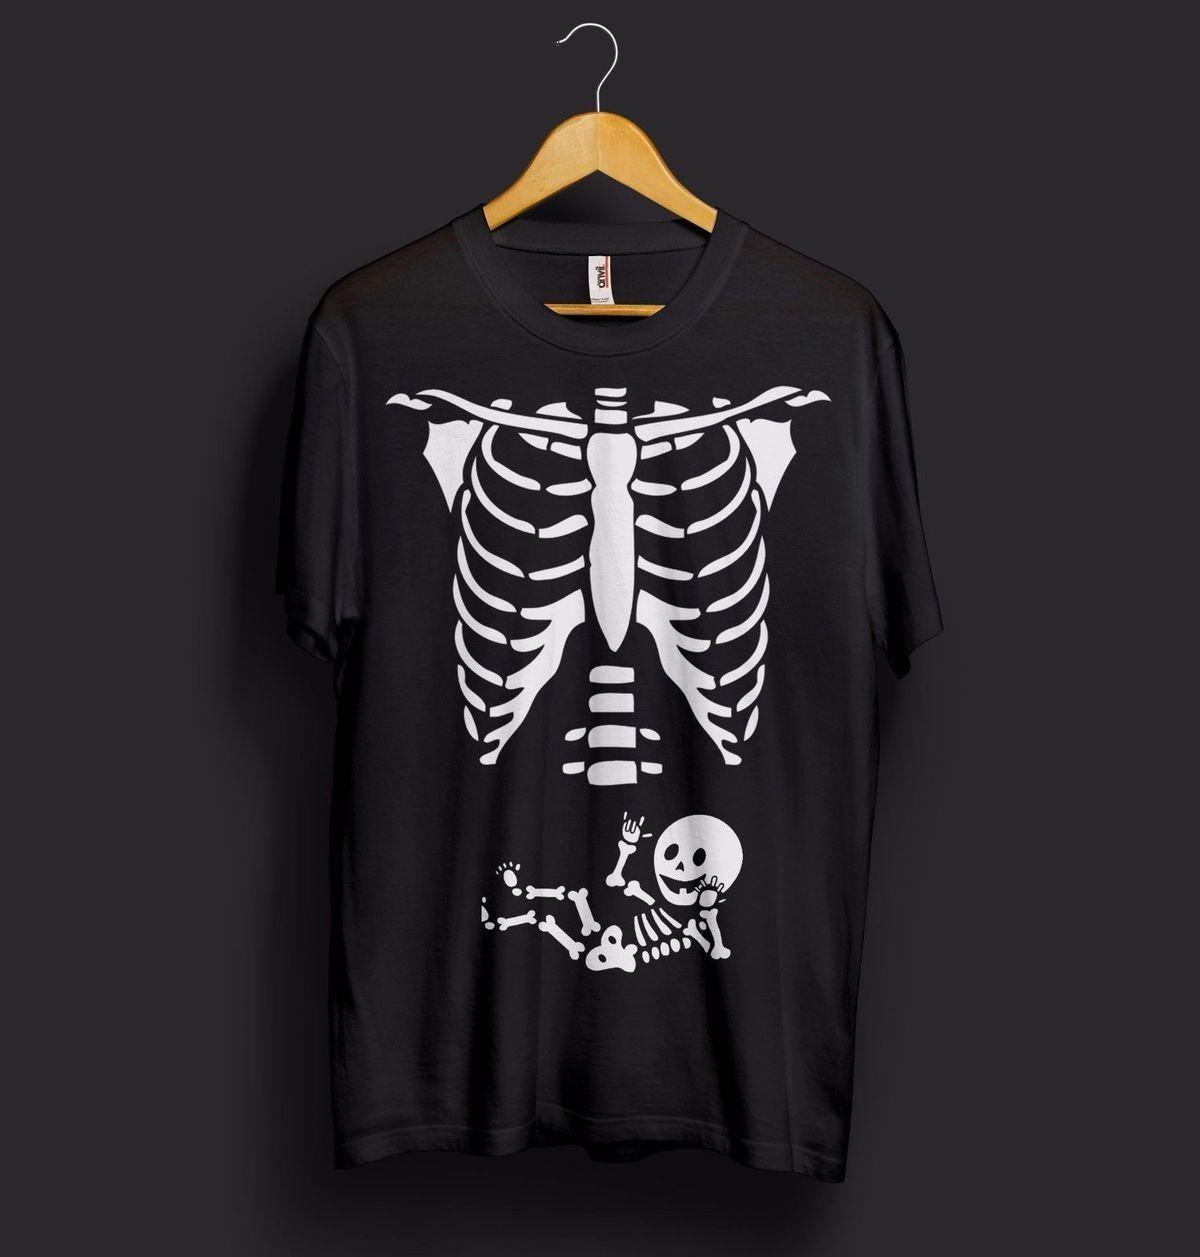 Pregnant Skeleton Womens Girls Short Sleeve Cotton Top Fancy Funny T Shirt Lot